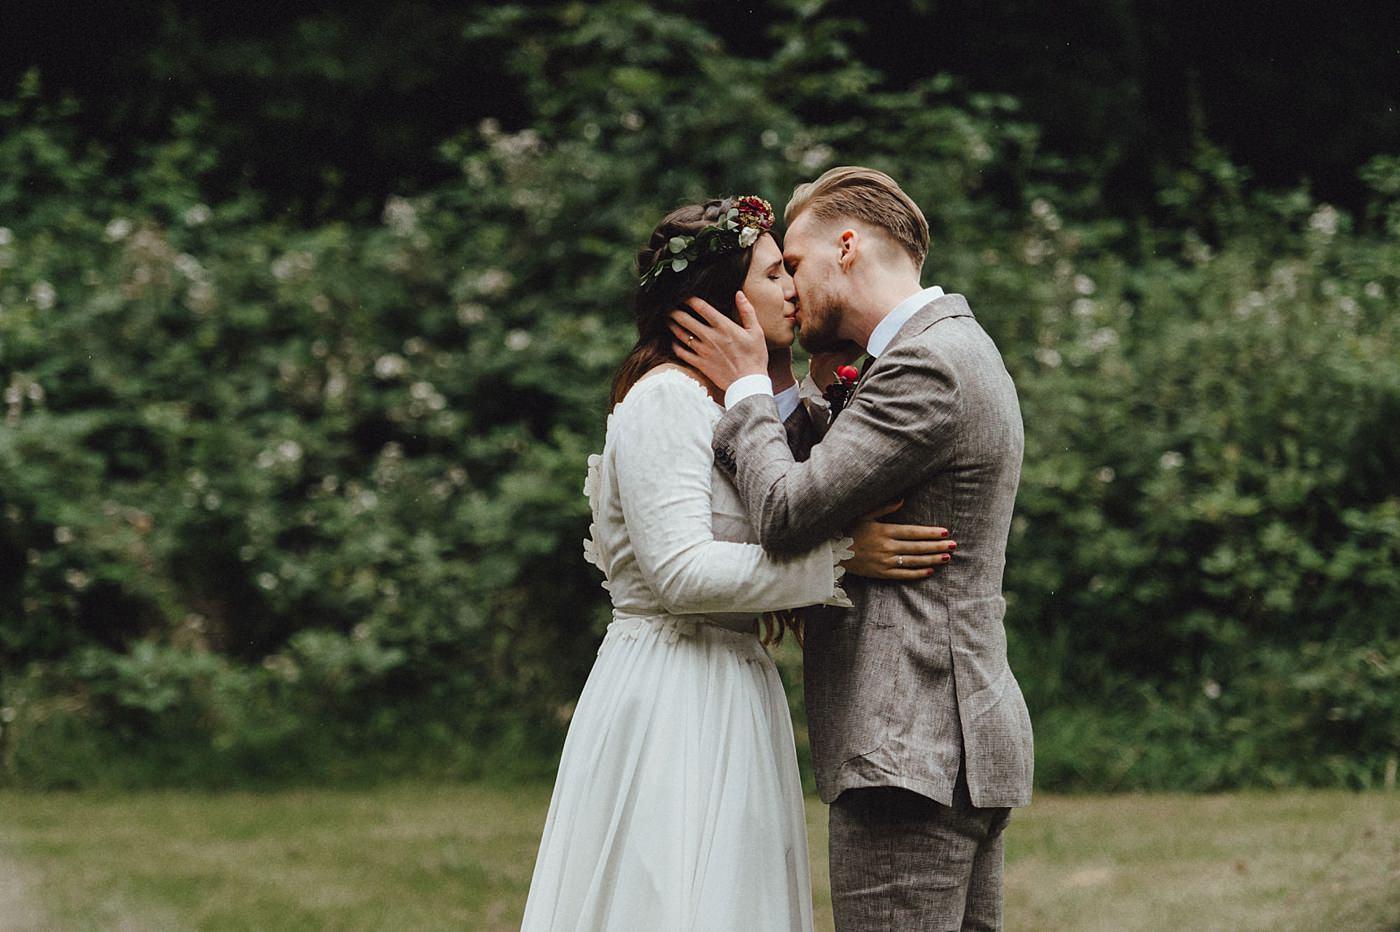 urban-elopement-wedding-124